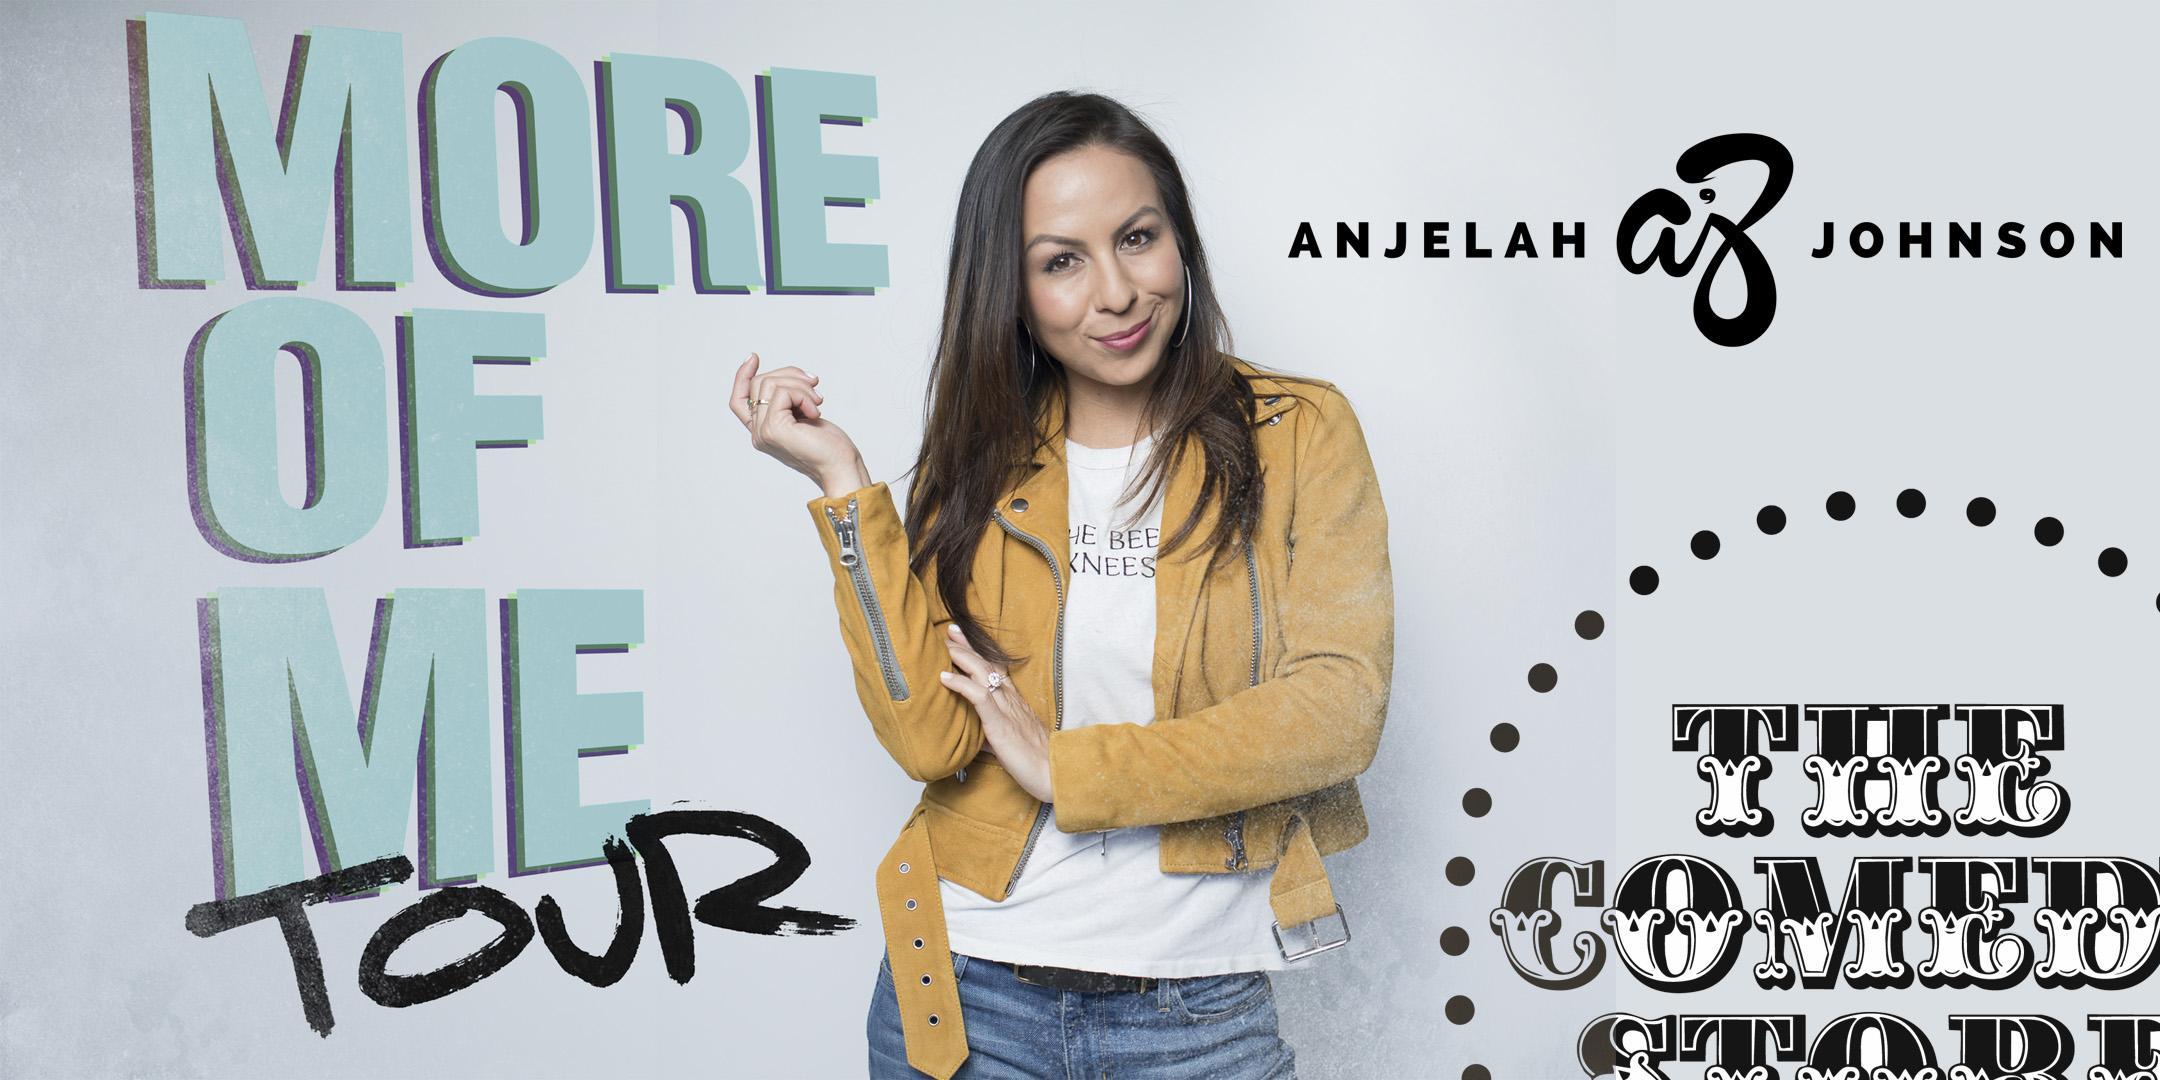 Anjelah Johnson - Sunday - 7:30 pm Showtime